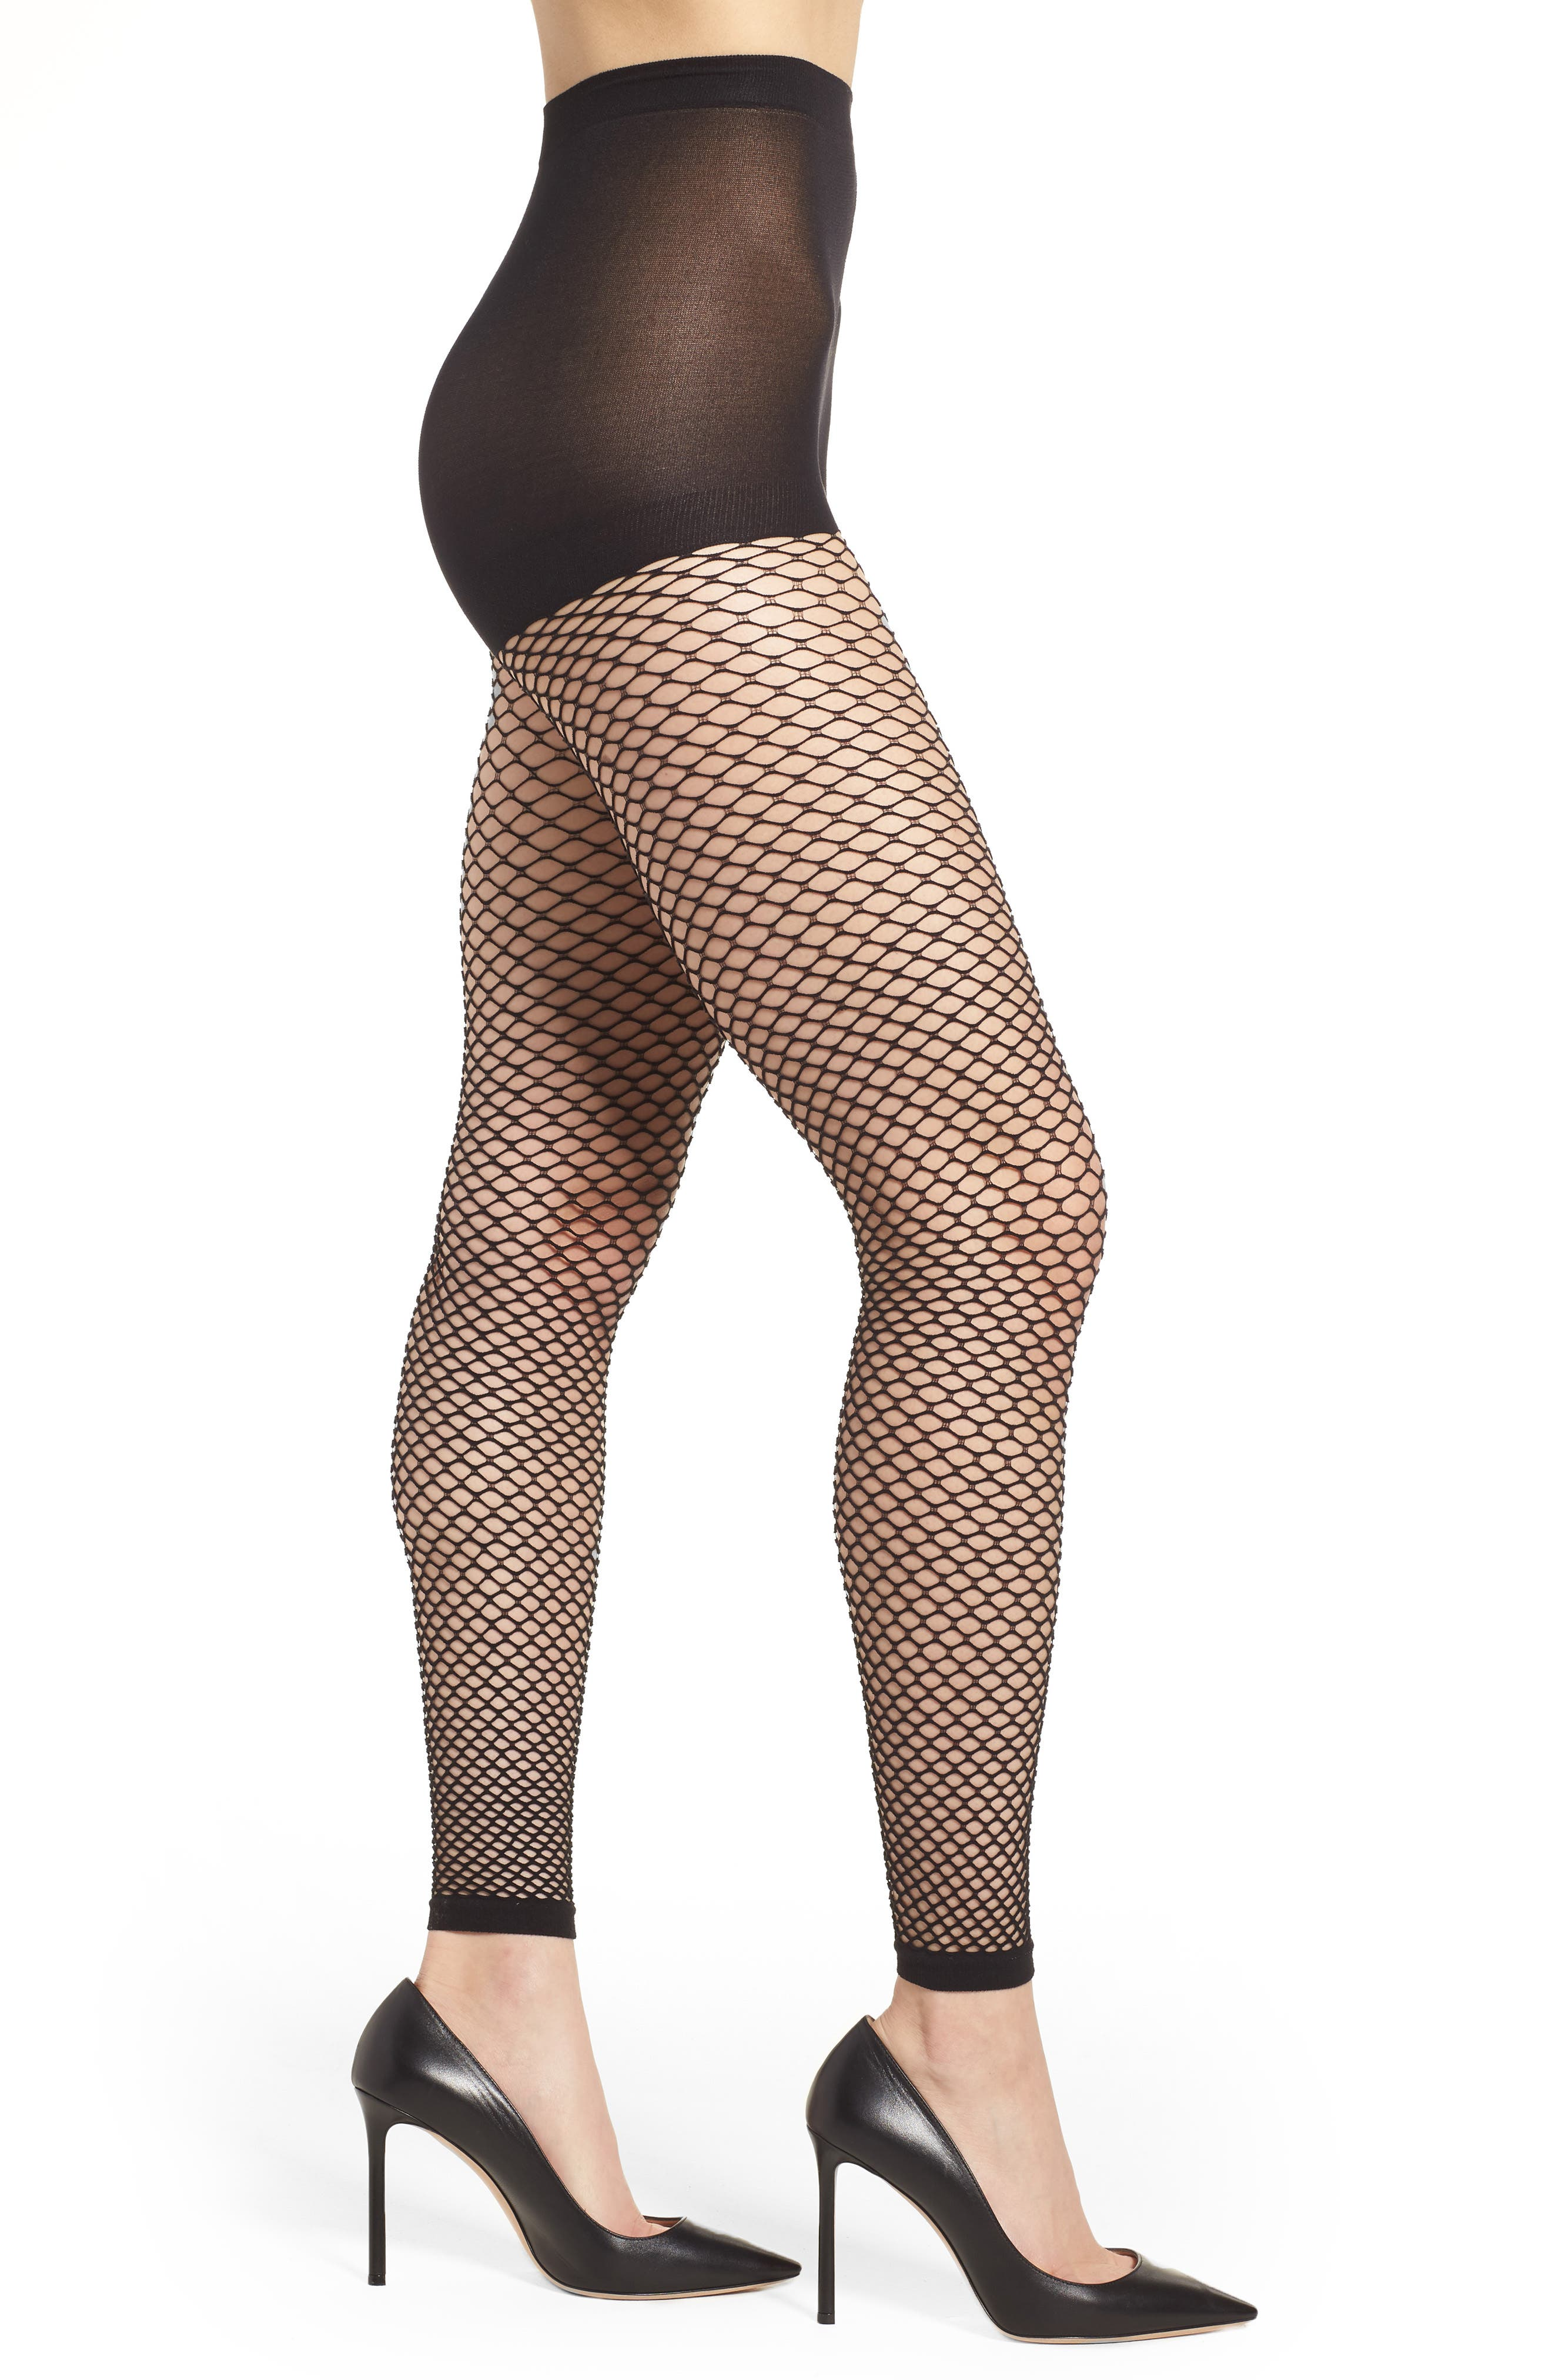 Footless Summer Fishnet Tights,                         Main,                         color, Black